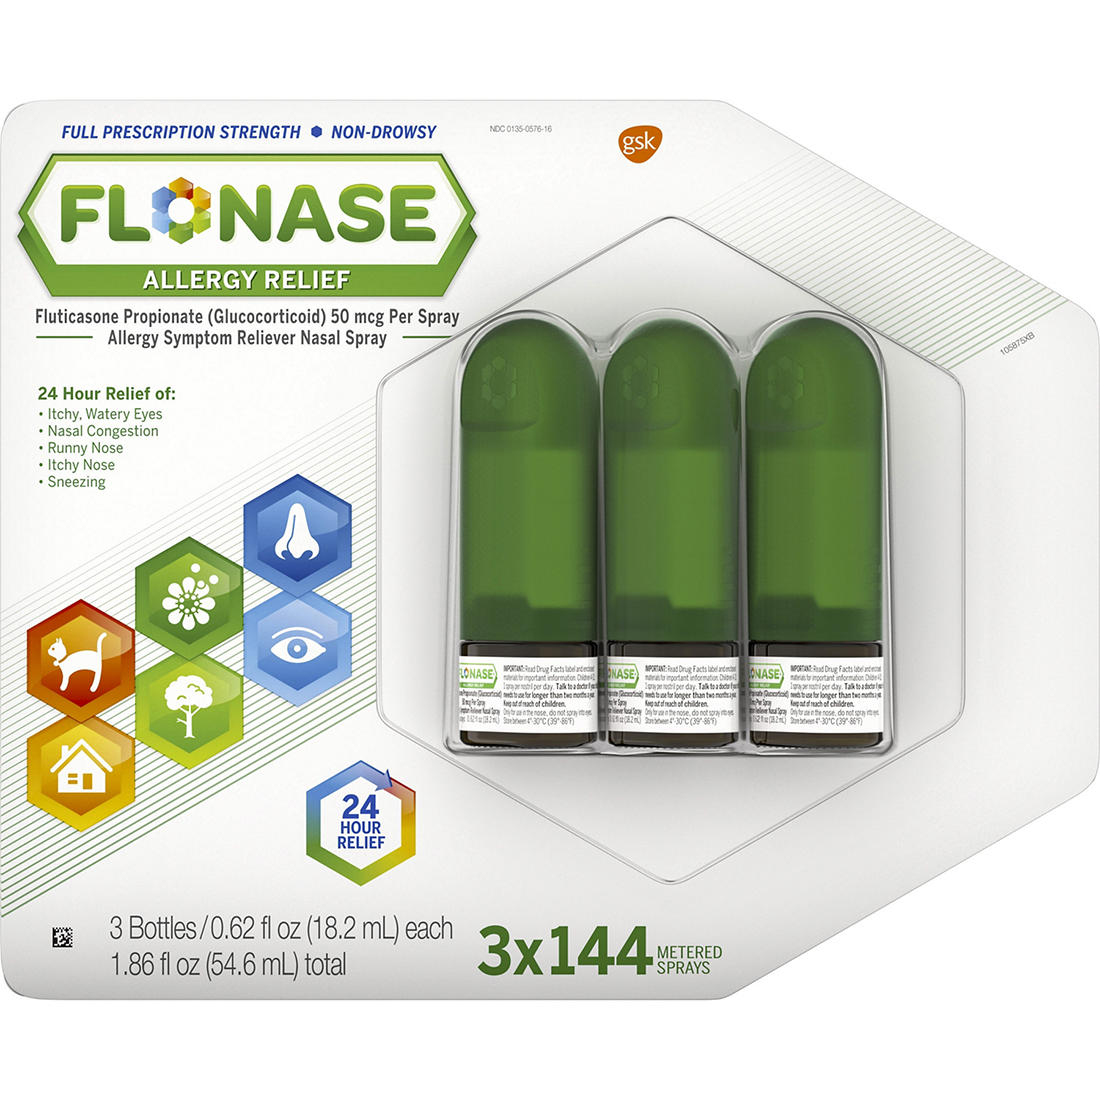 photograph about Flonase Coupon Printable identify Flonase Allergy Aid Nose Spray, 3 pk./0.62 fl. oz.